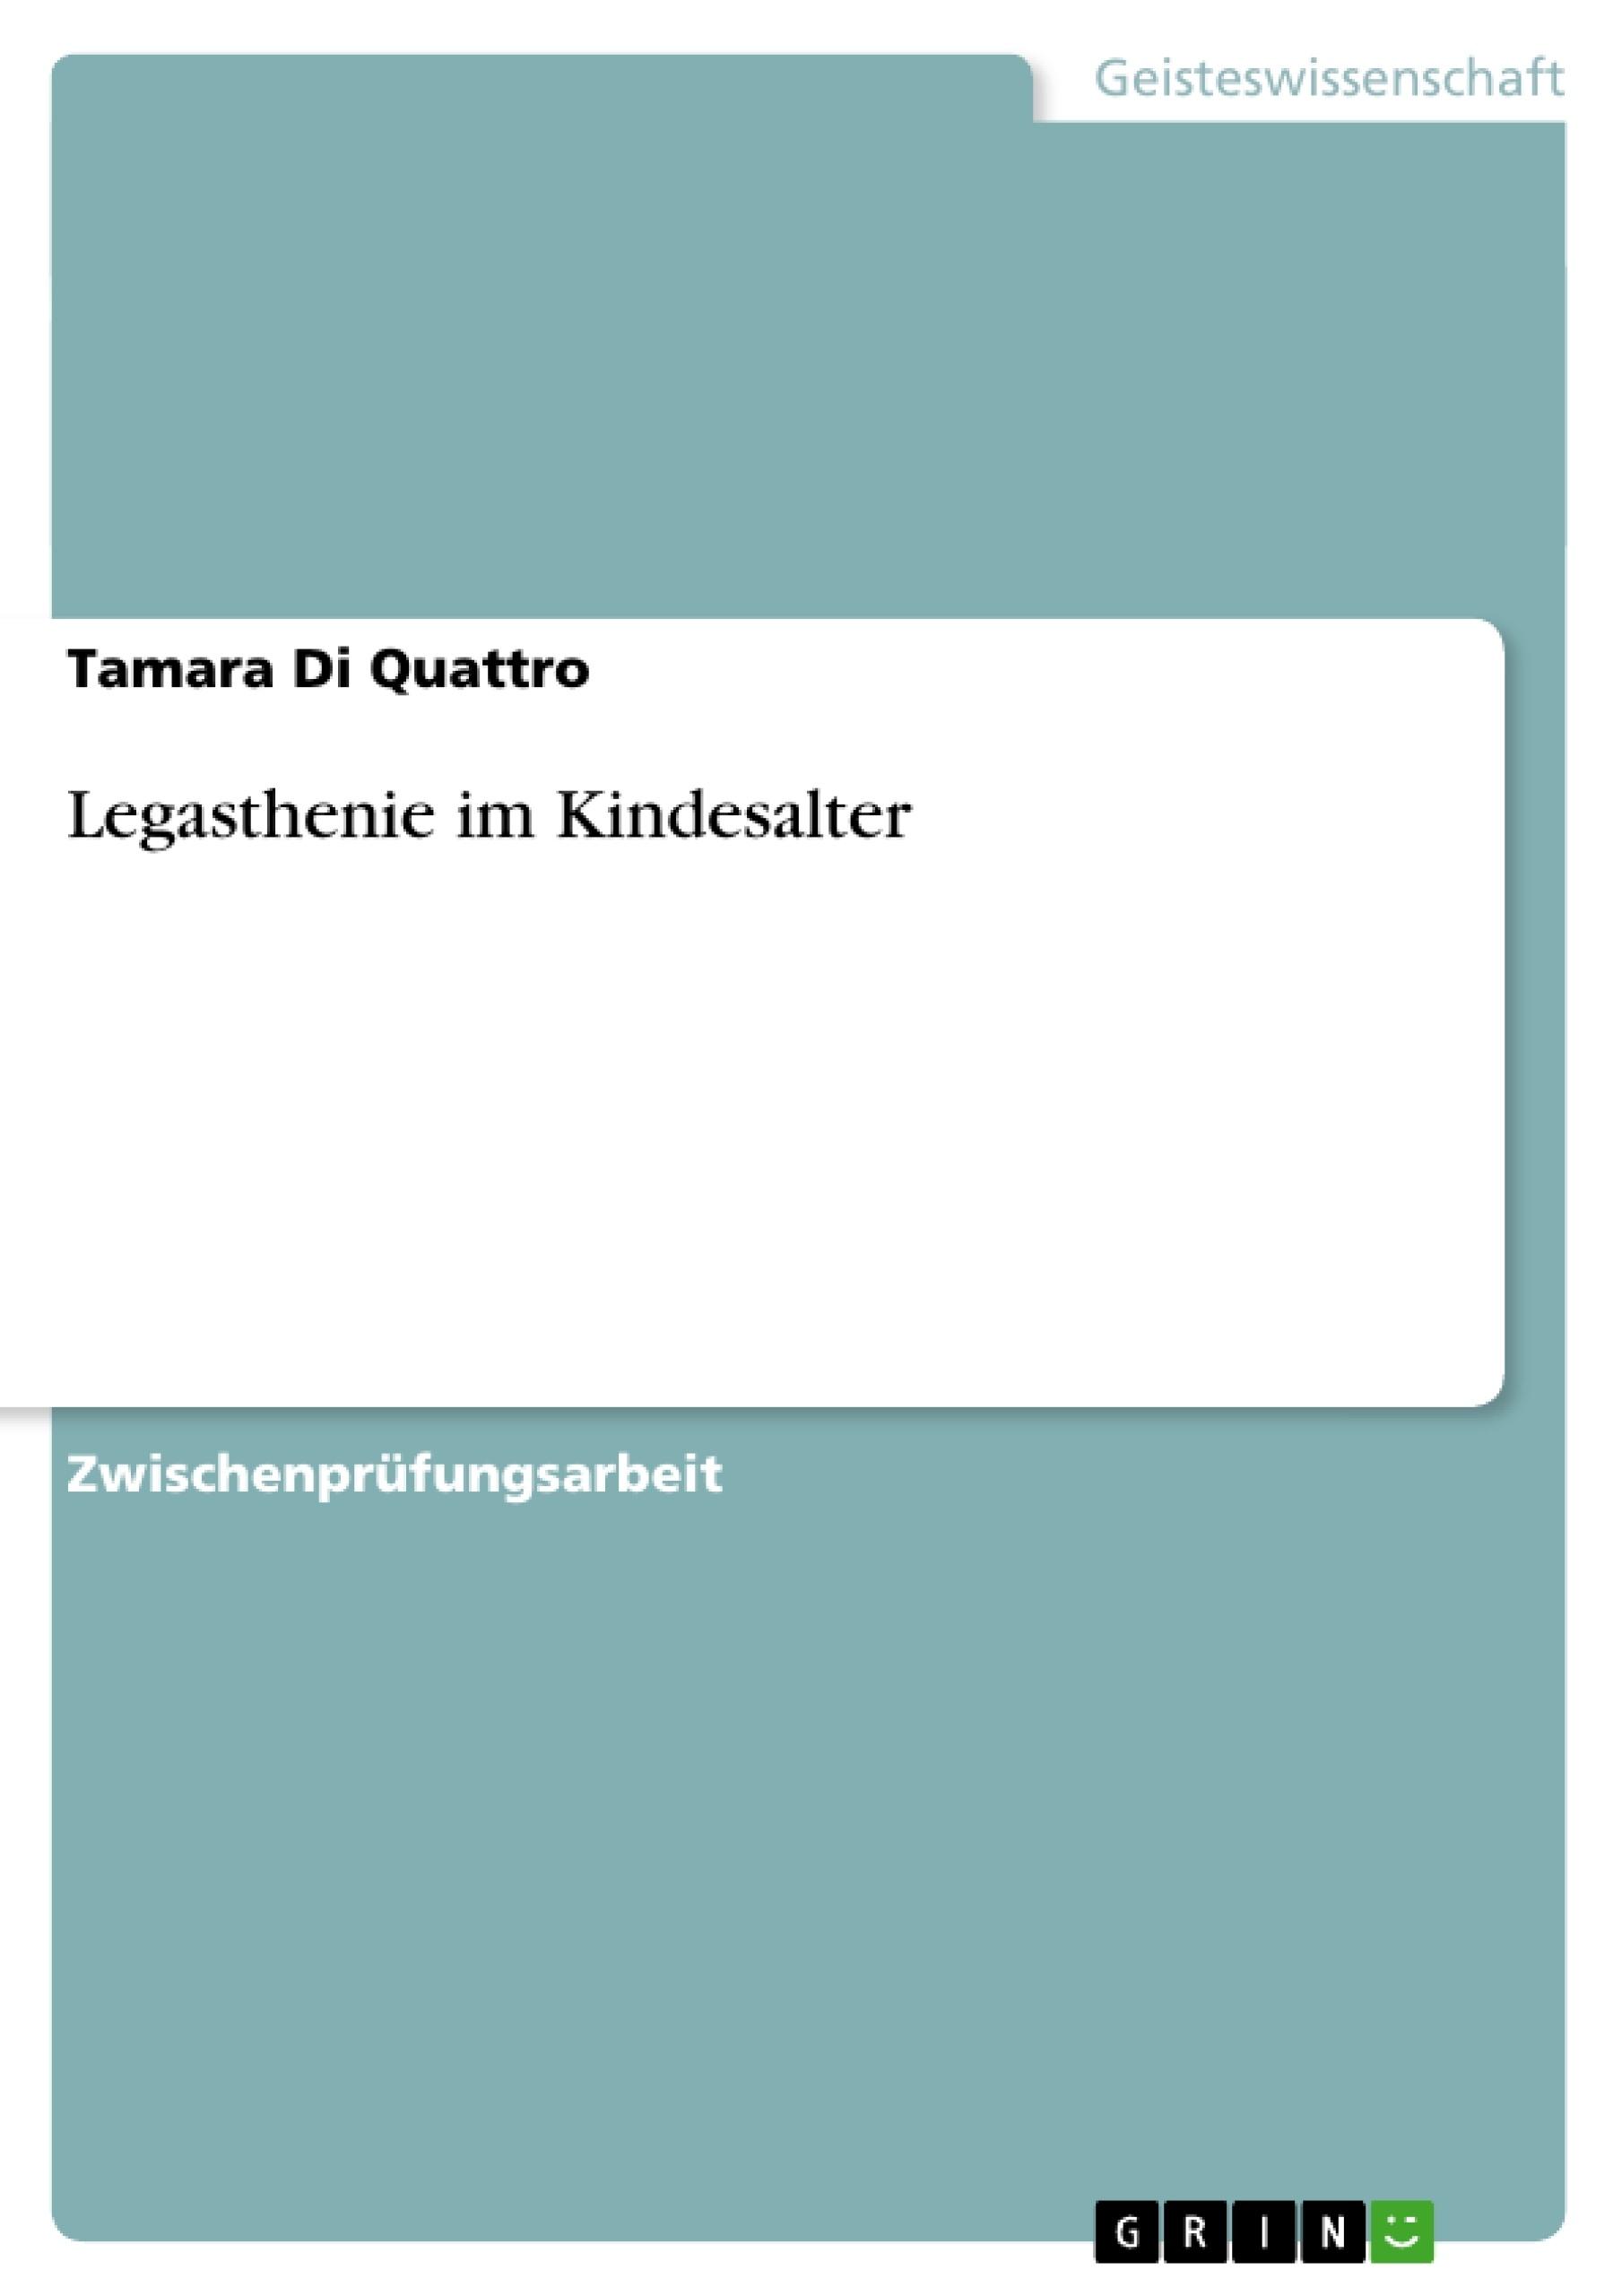 Titel: Legasthenie im Kindesalter